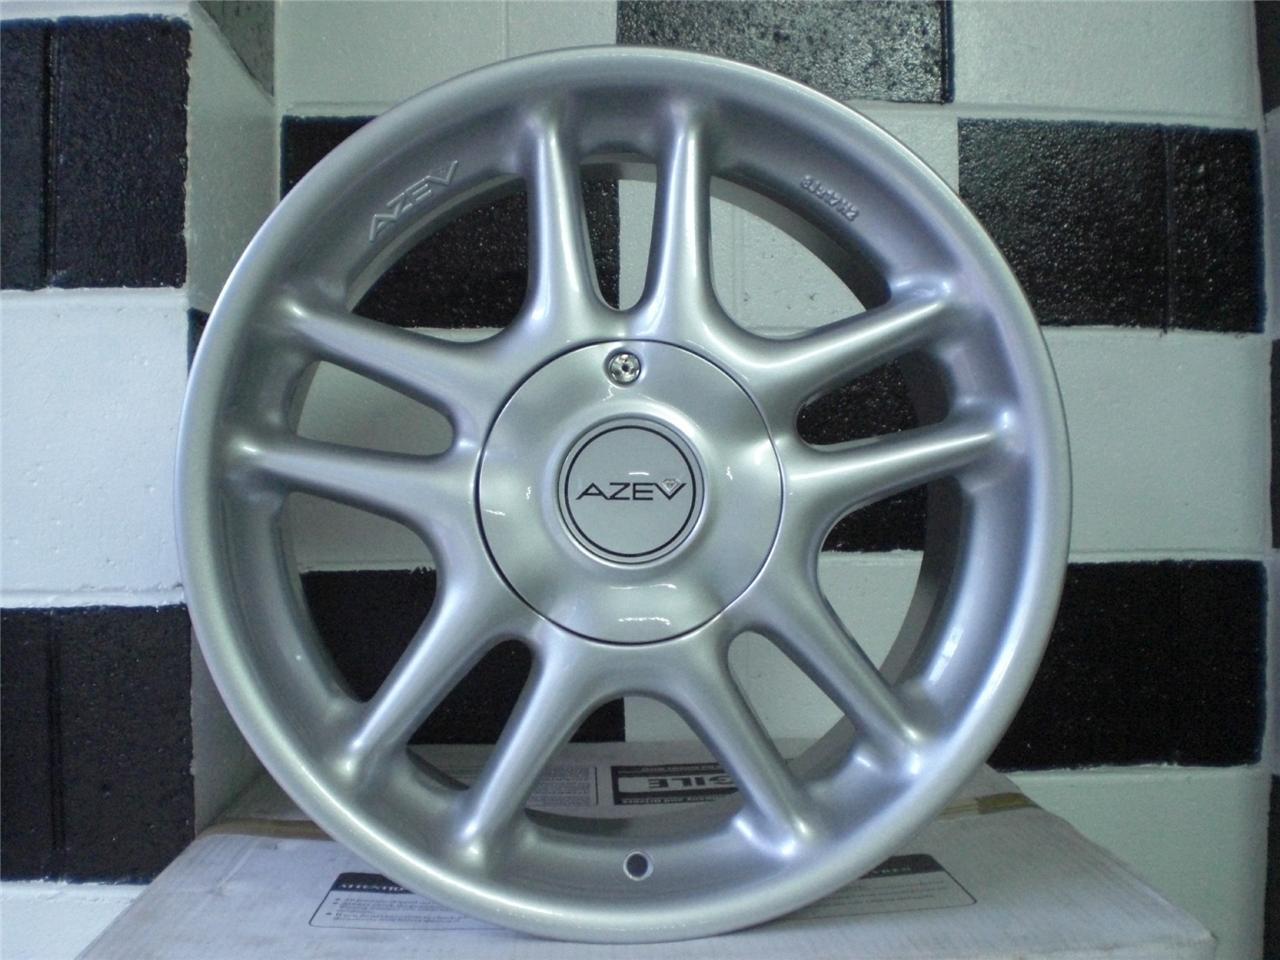 17-inch-AZEV-E-alloy-mag-wheels-5-98-5-114-5-130-suit-Japanese-Alfa-Porsche